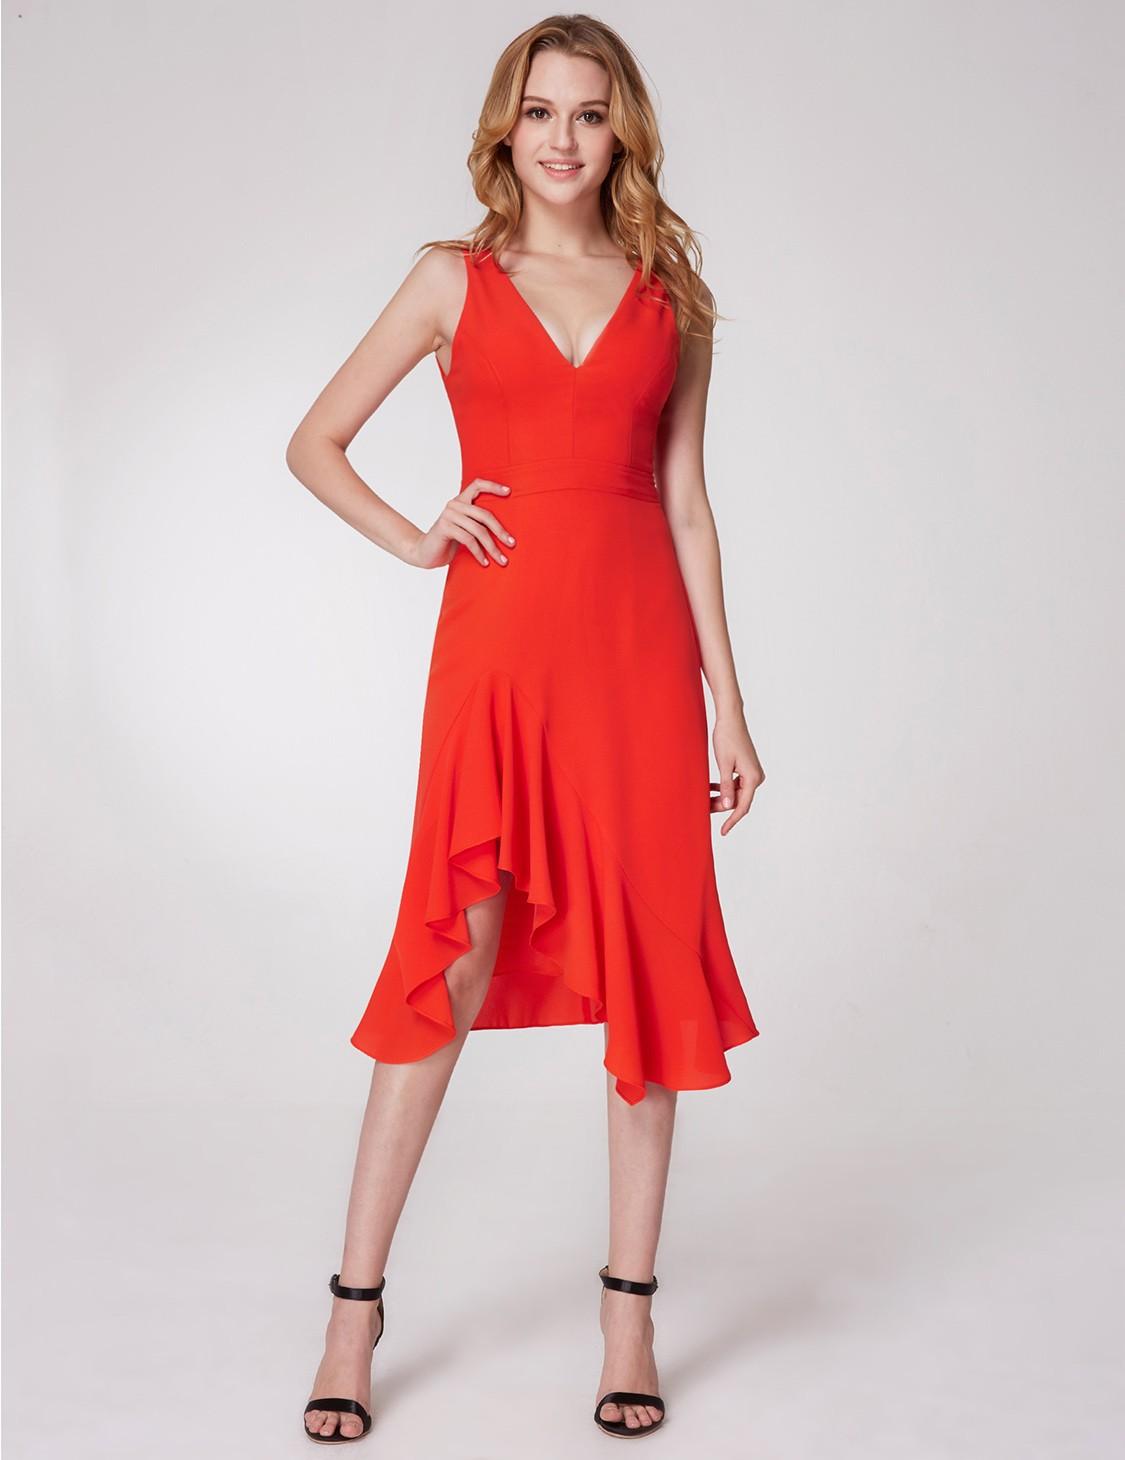 d2d5167d1d9d84 Rood zomers jurkje met salsa look Vera